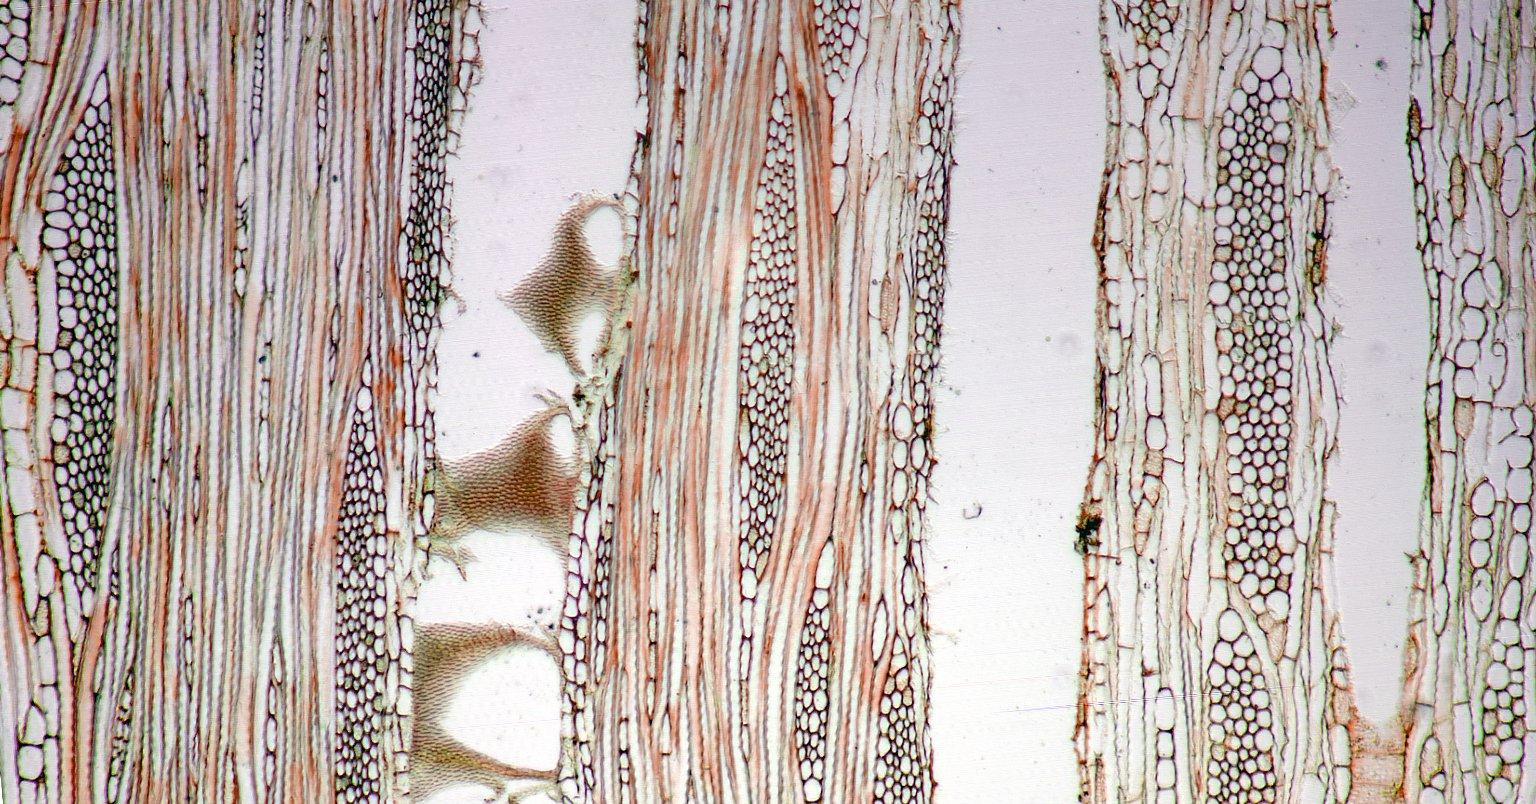 VOCHYSIACEAE Vochysia neyratii